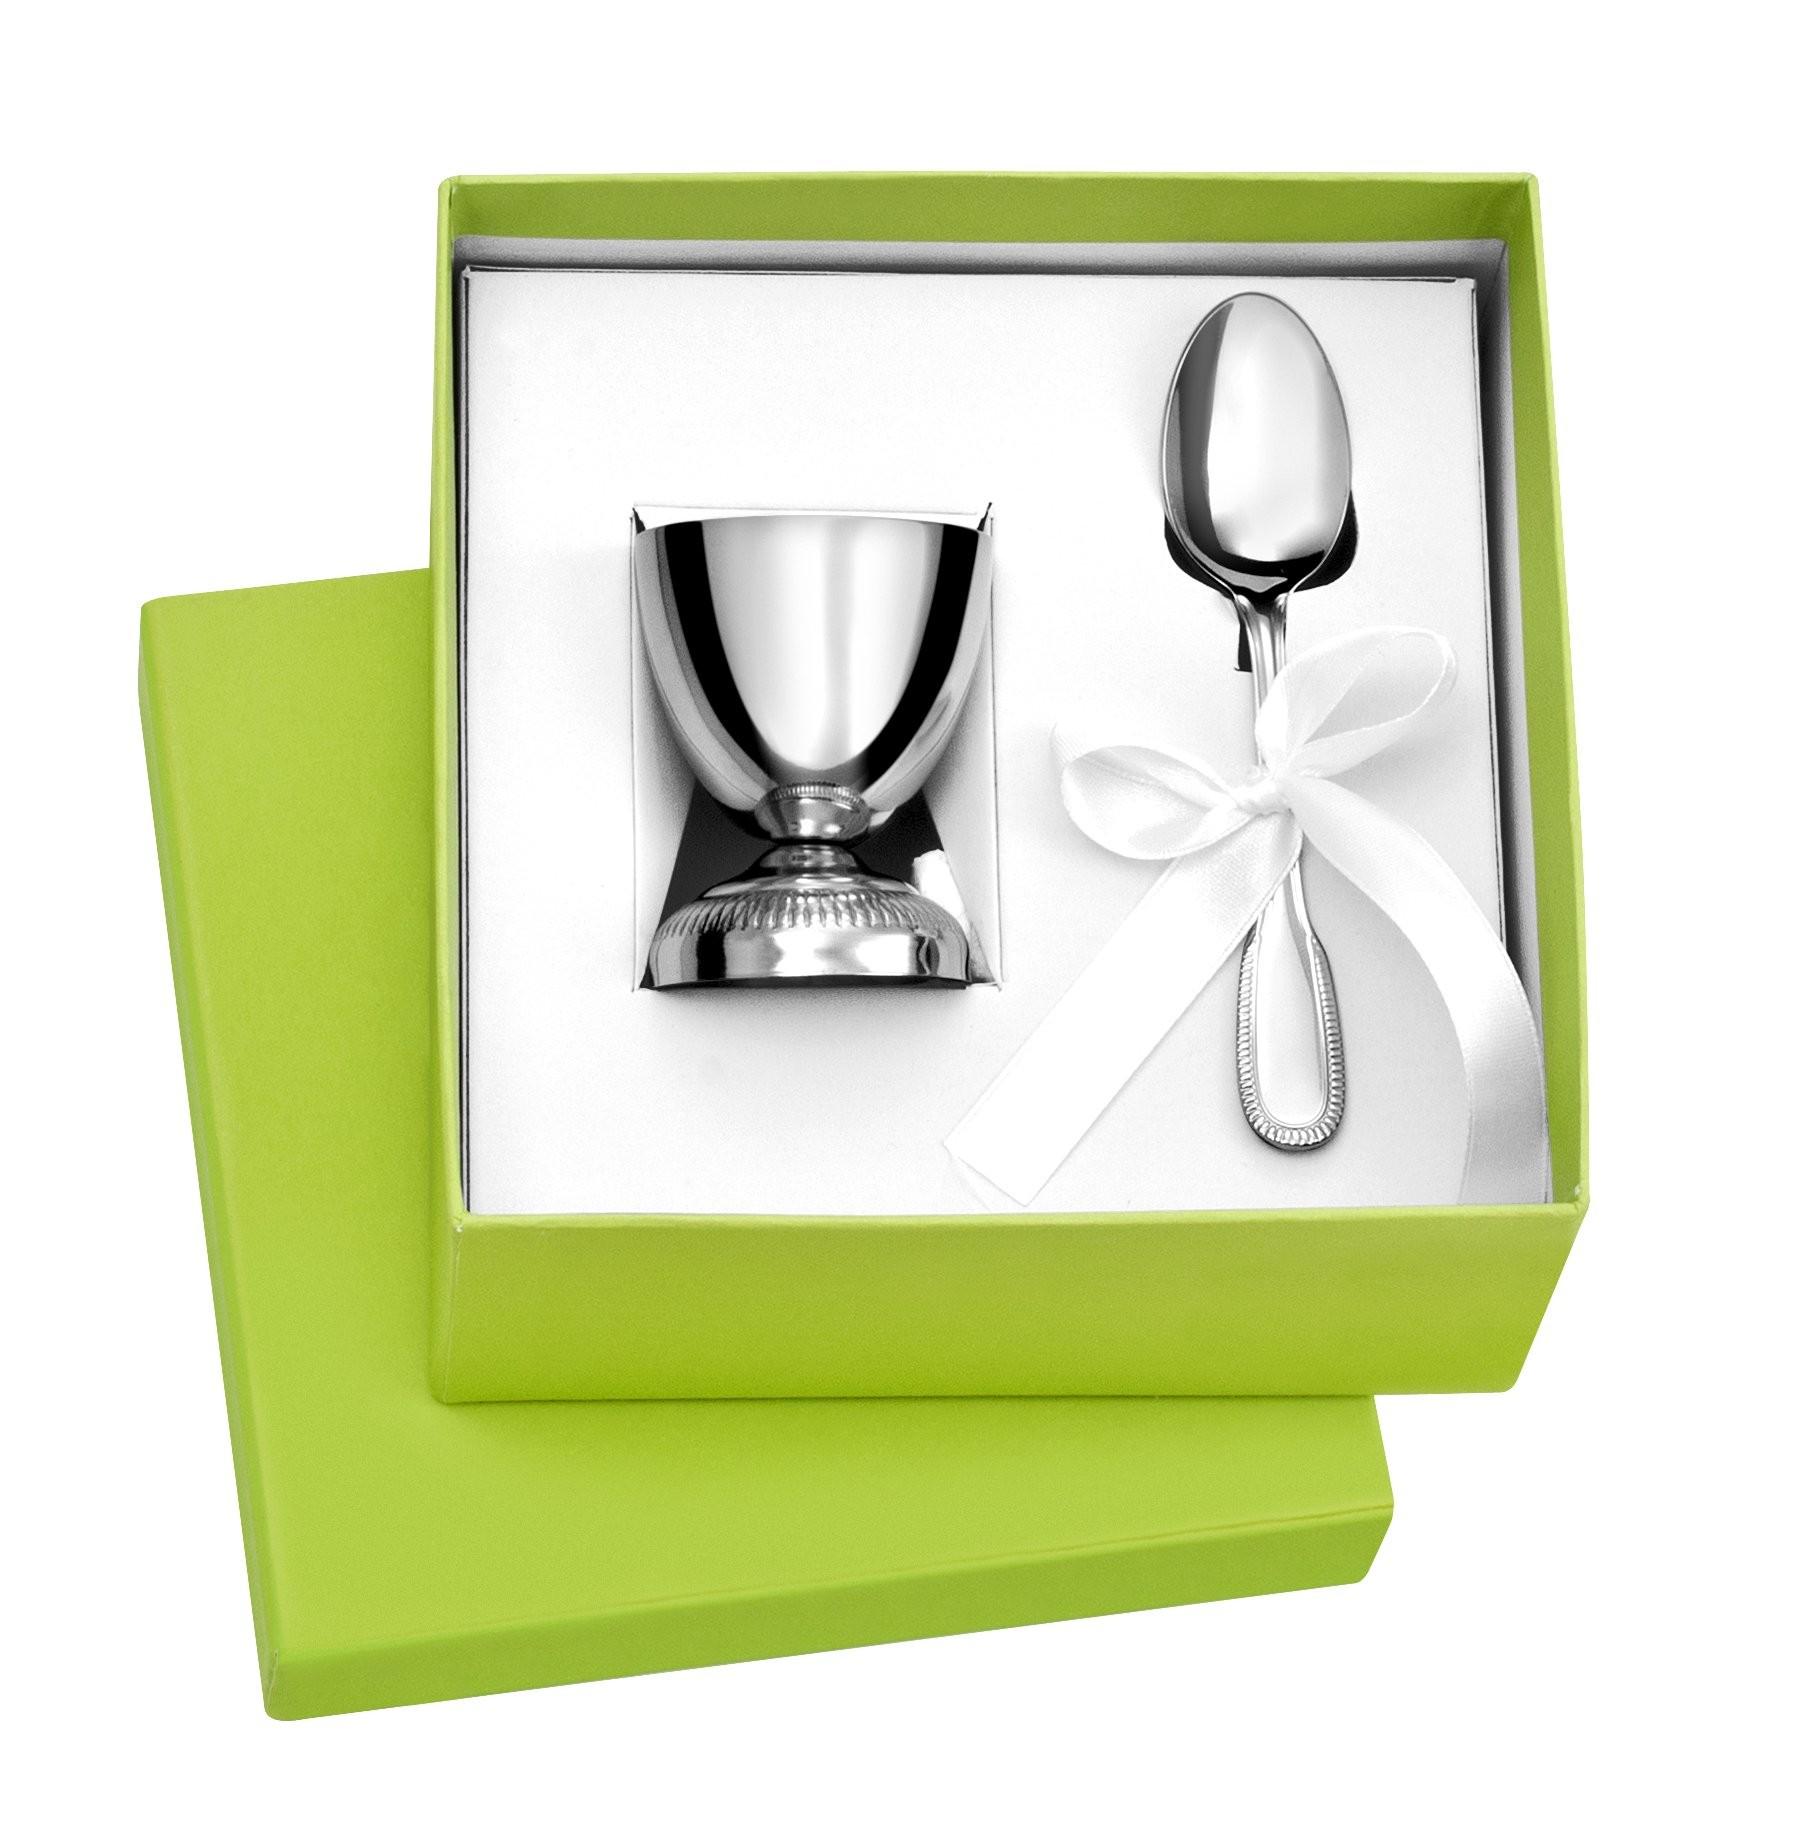 coffret cadeau coquetier et cuill re inox 1001 m dailles. Black Bedroom Furniture Sets. Home Design Ideas